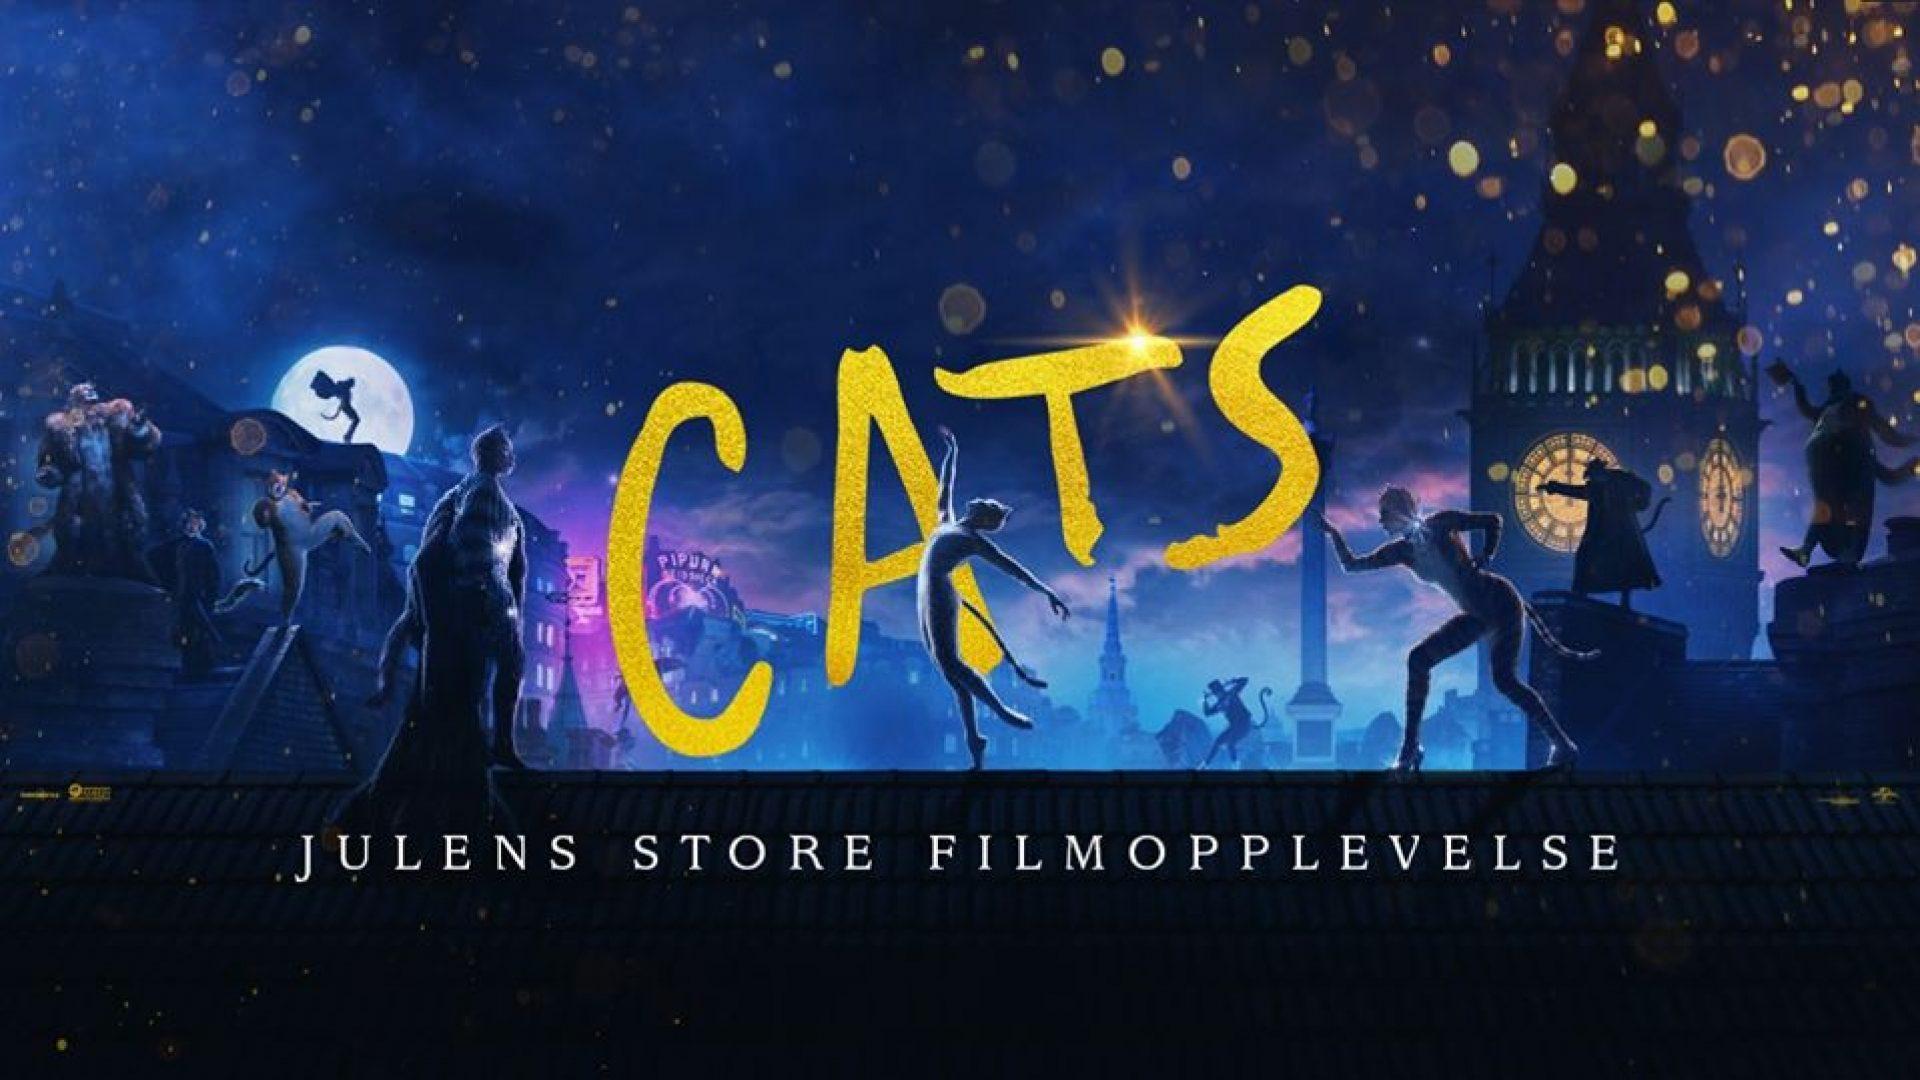 Bilde fra kinofilmen Cats